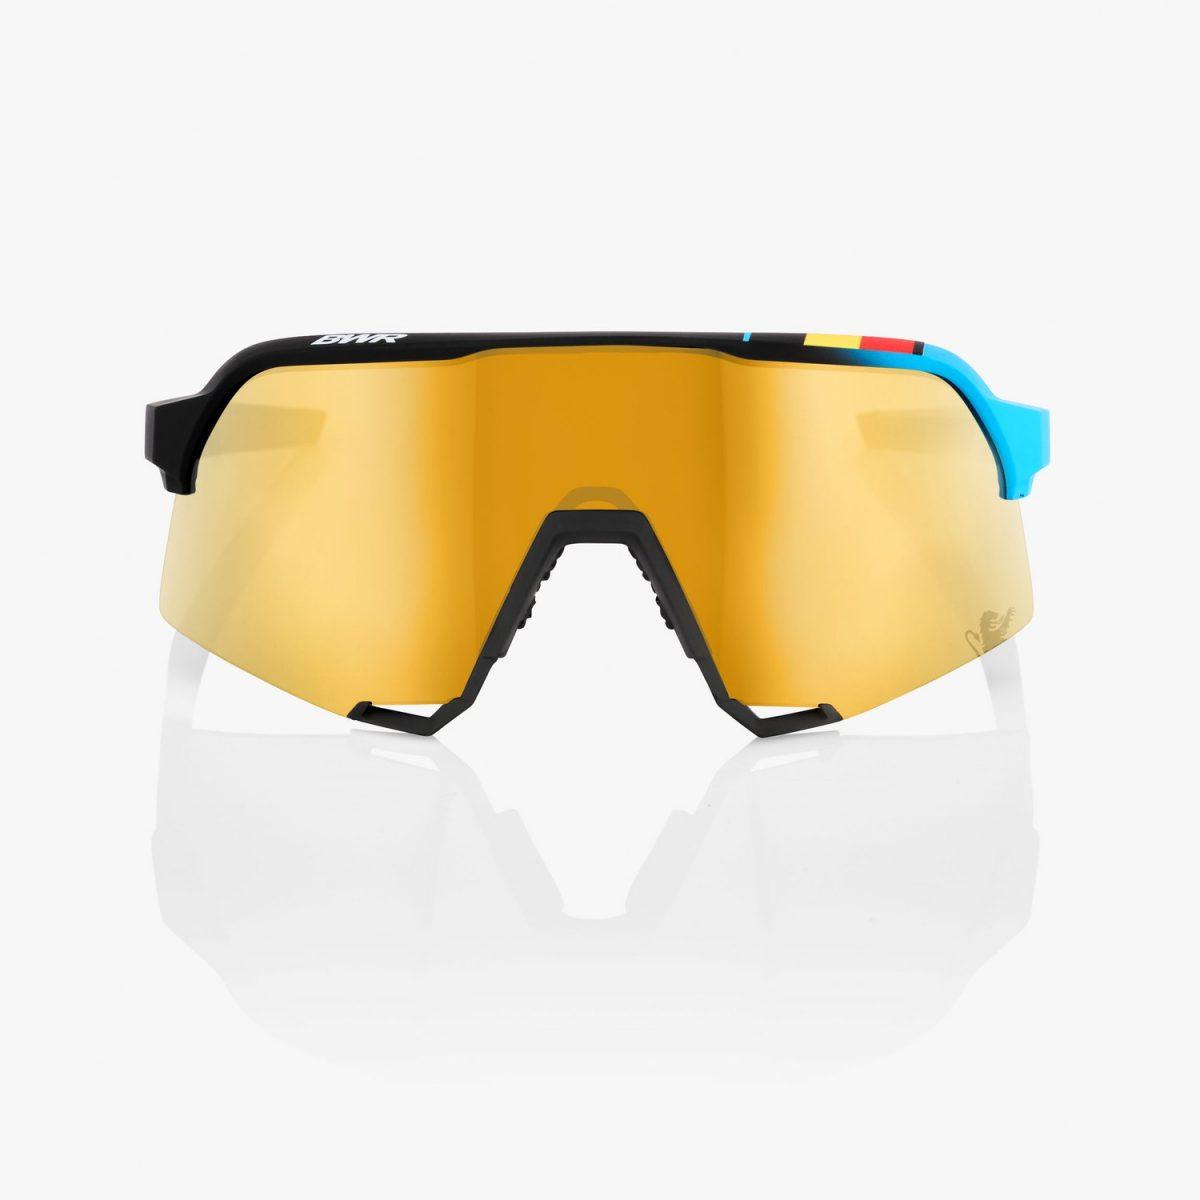 Belgian Waffle Ride sunglasses